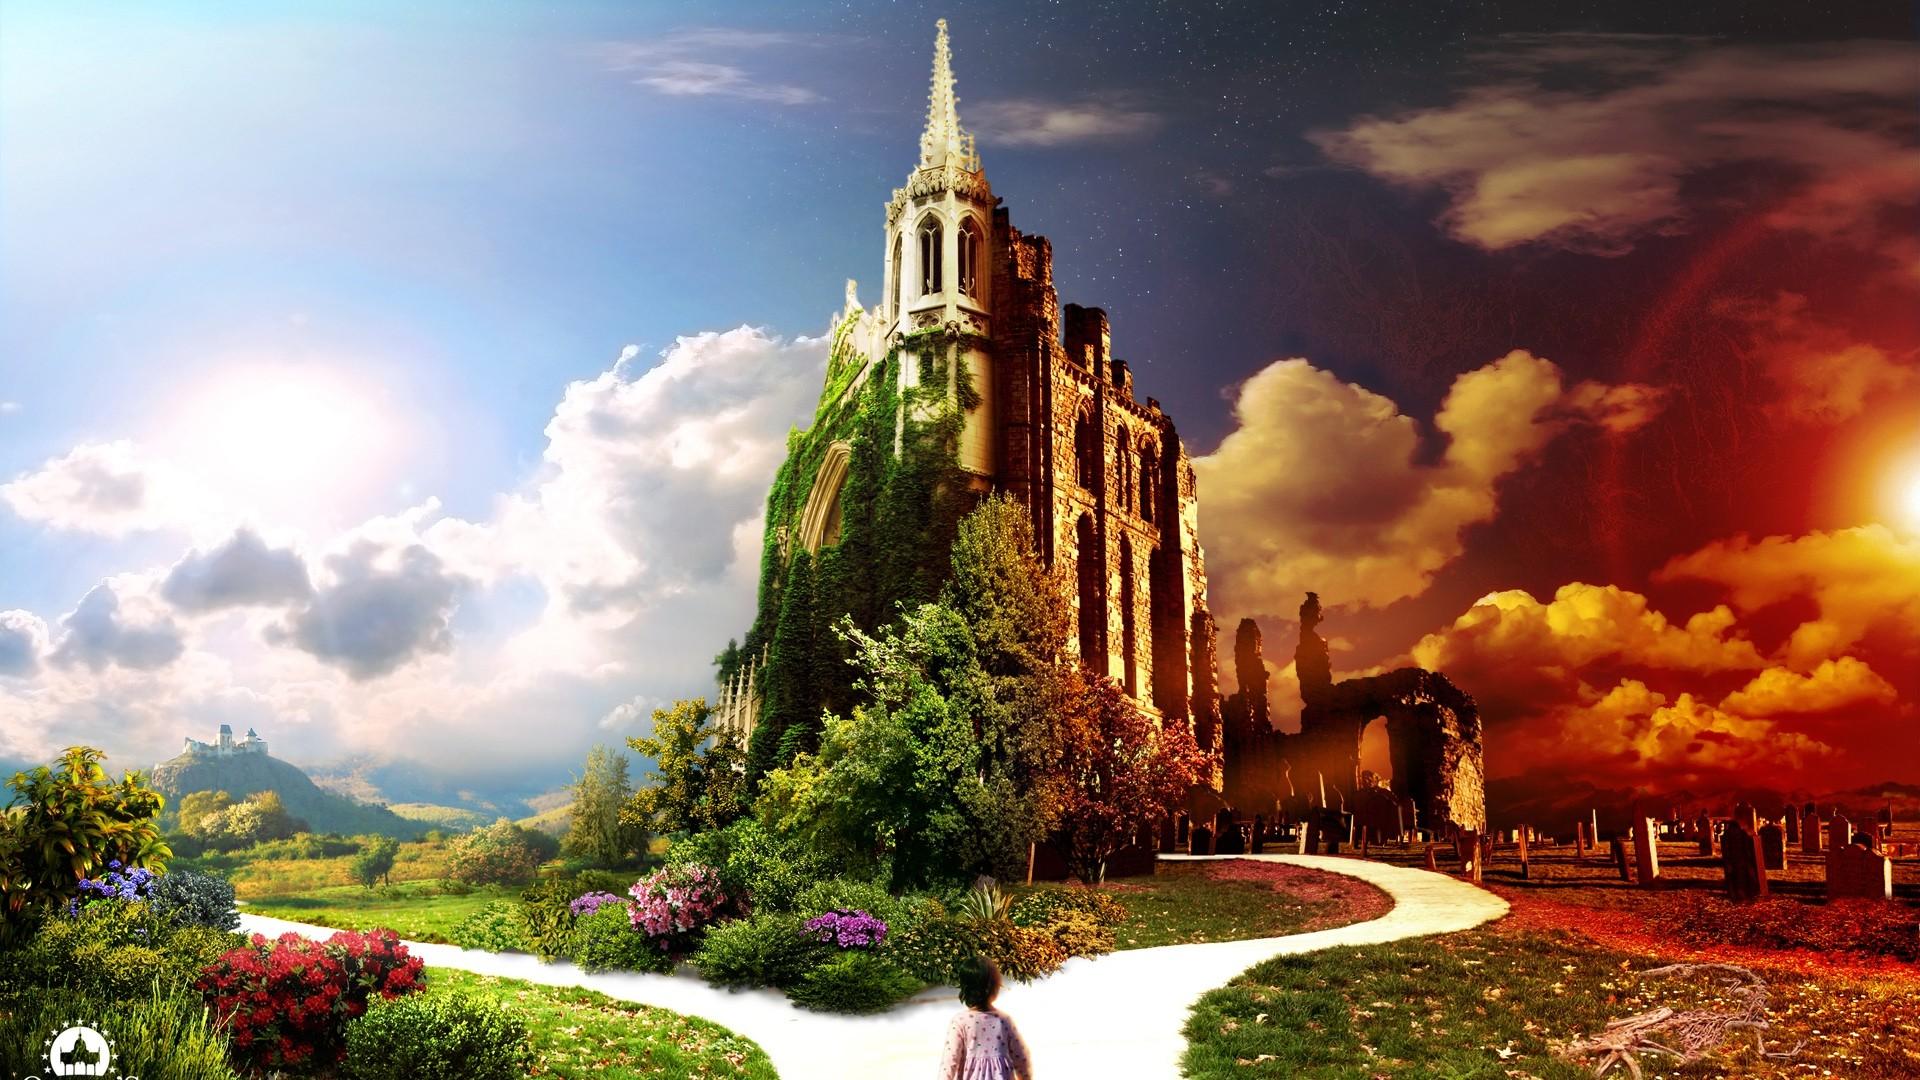 General 1920x1080 landscape digital art fantasy art clouds flowers children